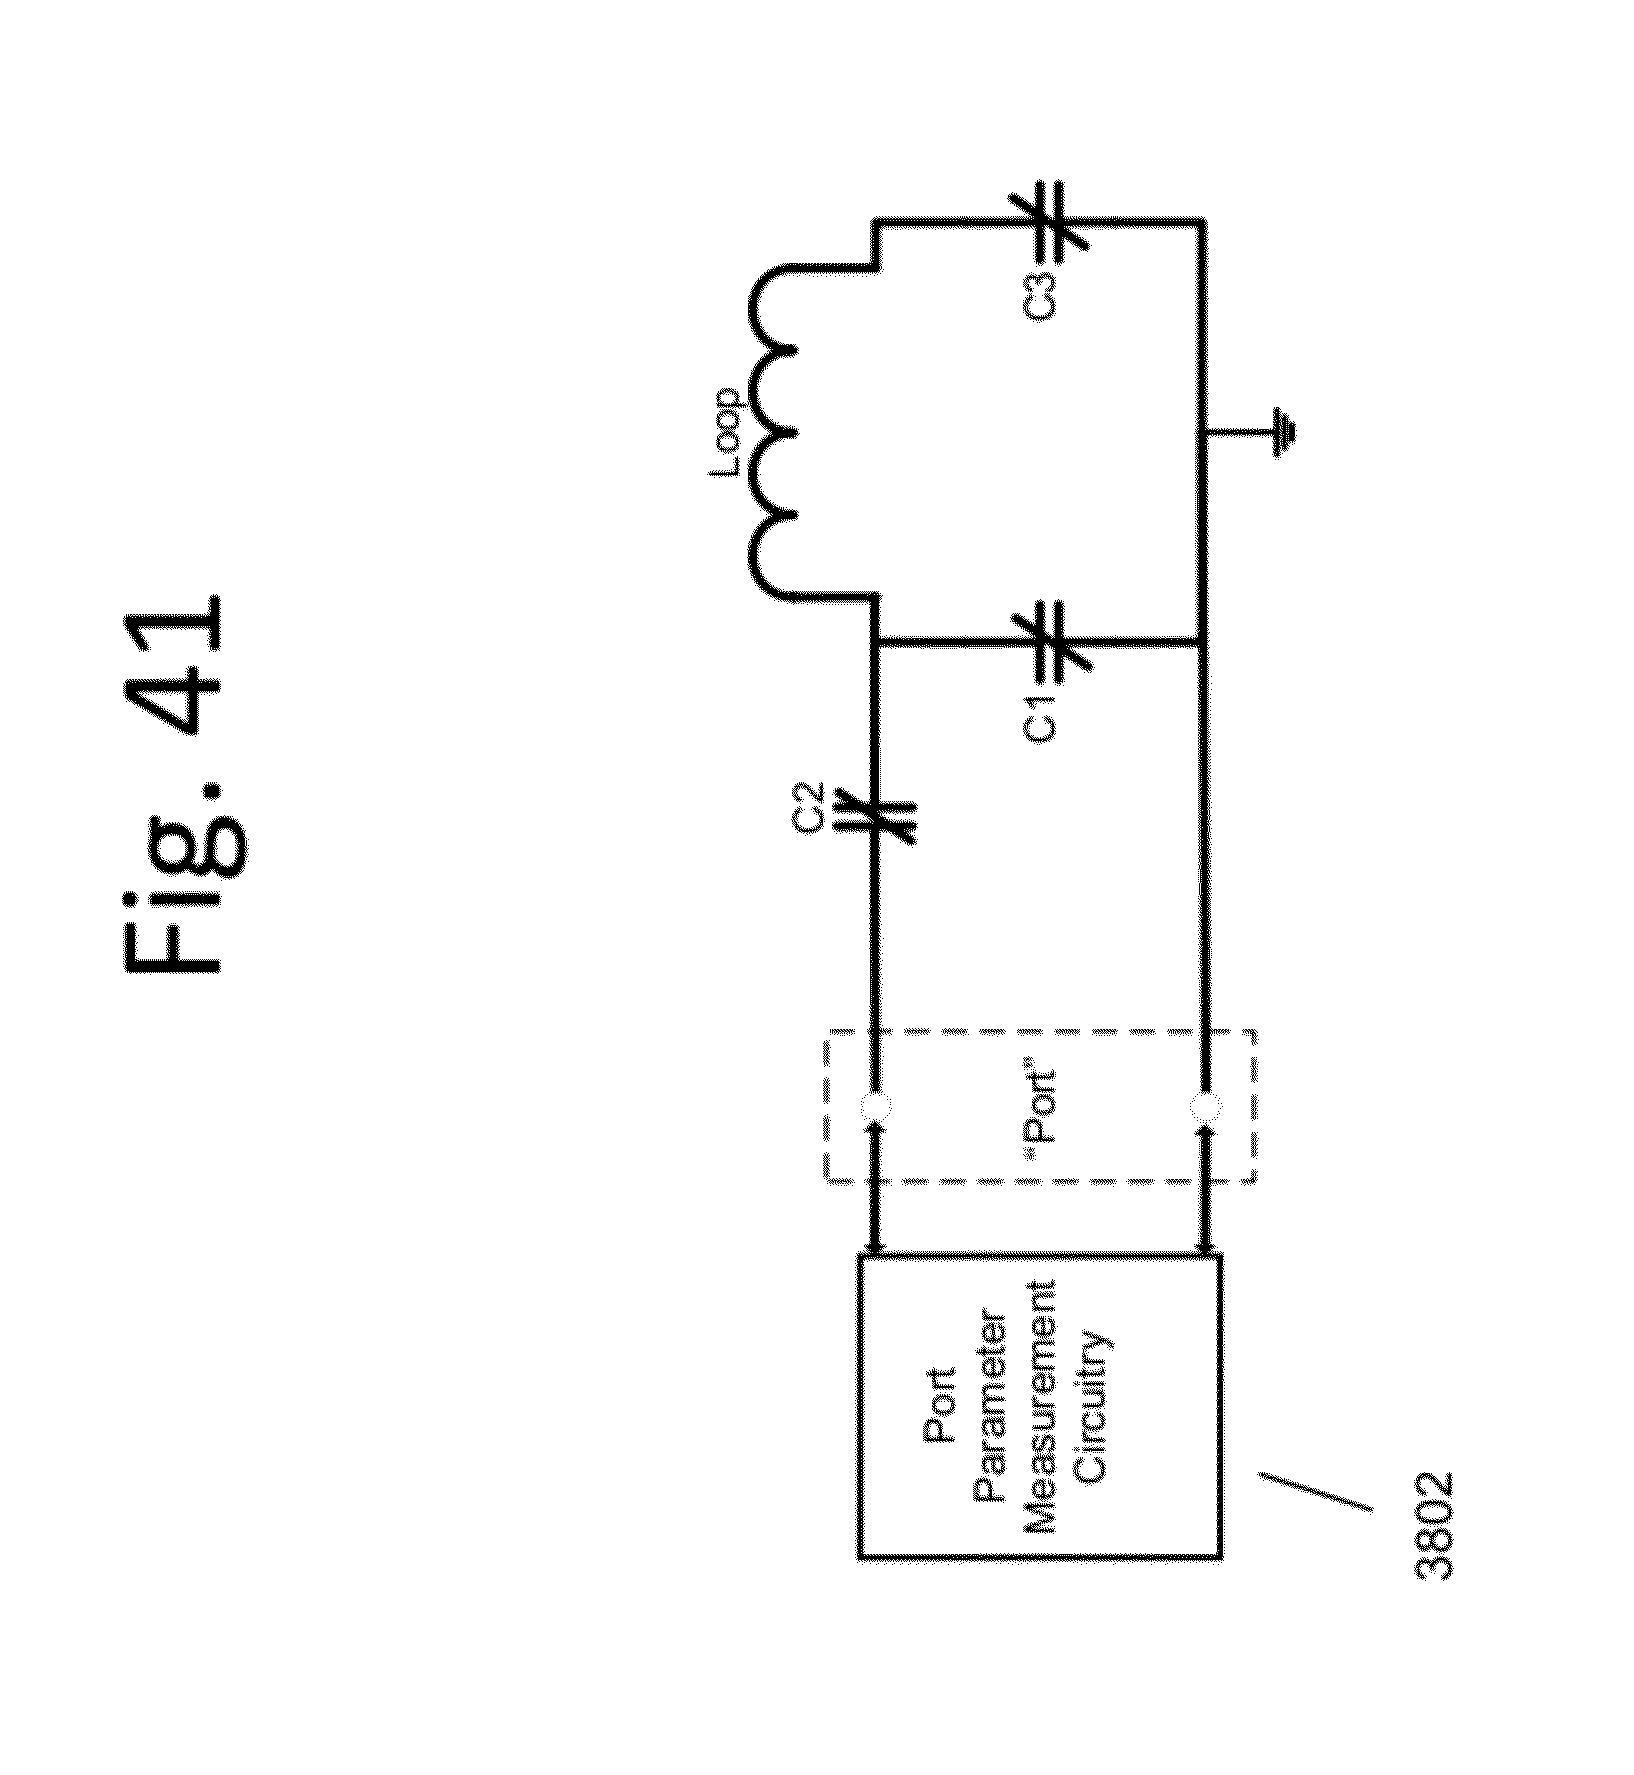 855e Bcb Wiring Diagram : 23 Wiring Diagram Images